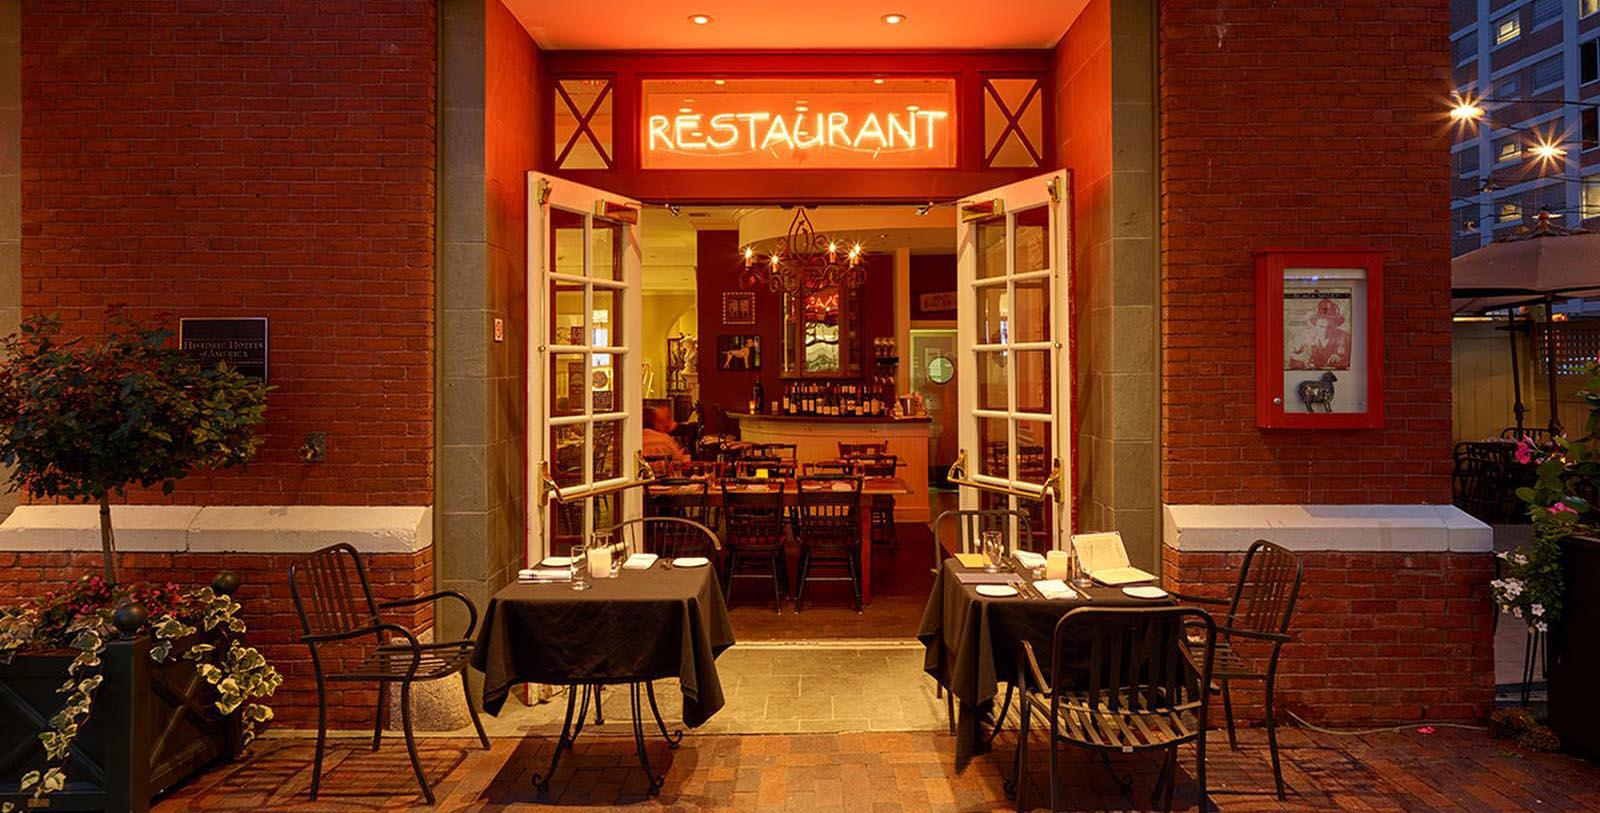 Image of The Black Sheep Restaurant & Bar The Kendall Hotel, 1894, Member of Historic Hotels of America, in Cambridge, Massachusetts, Taste